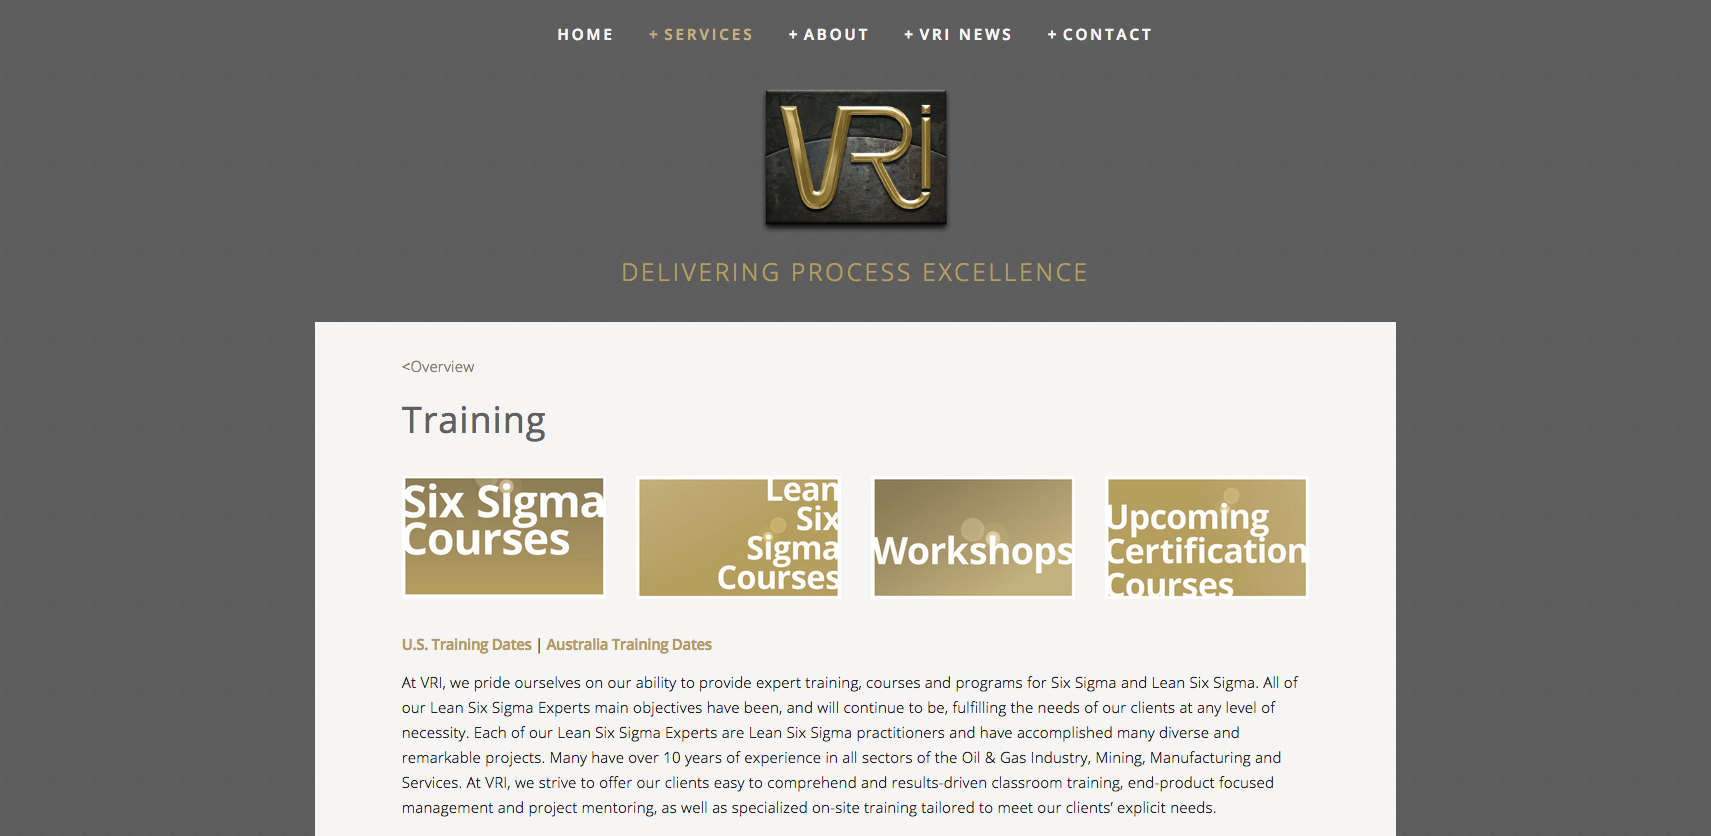 VRI Training